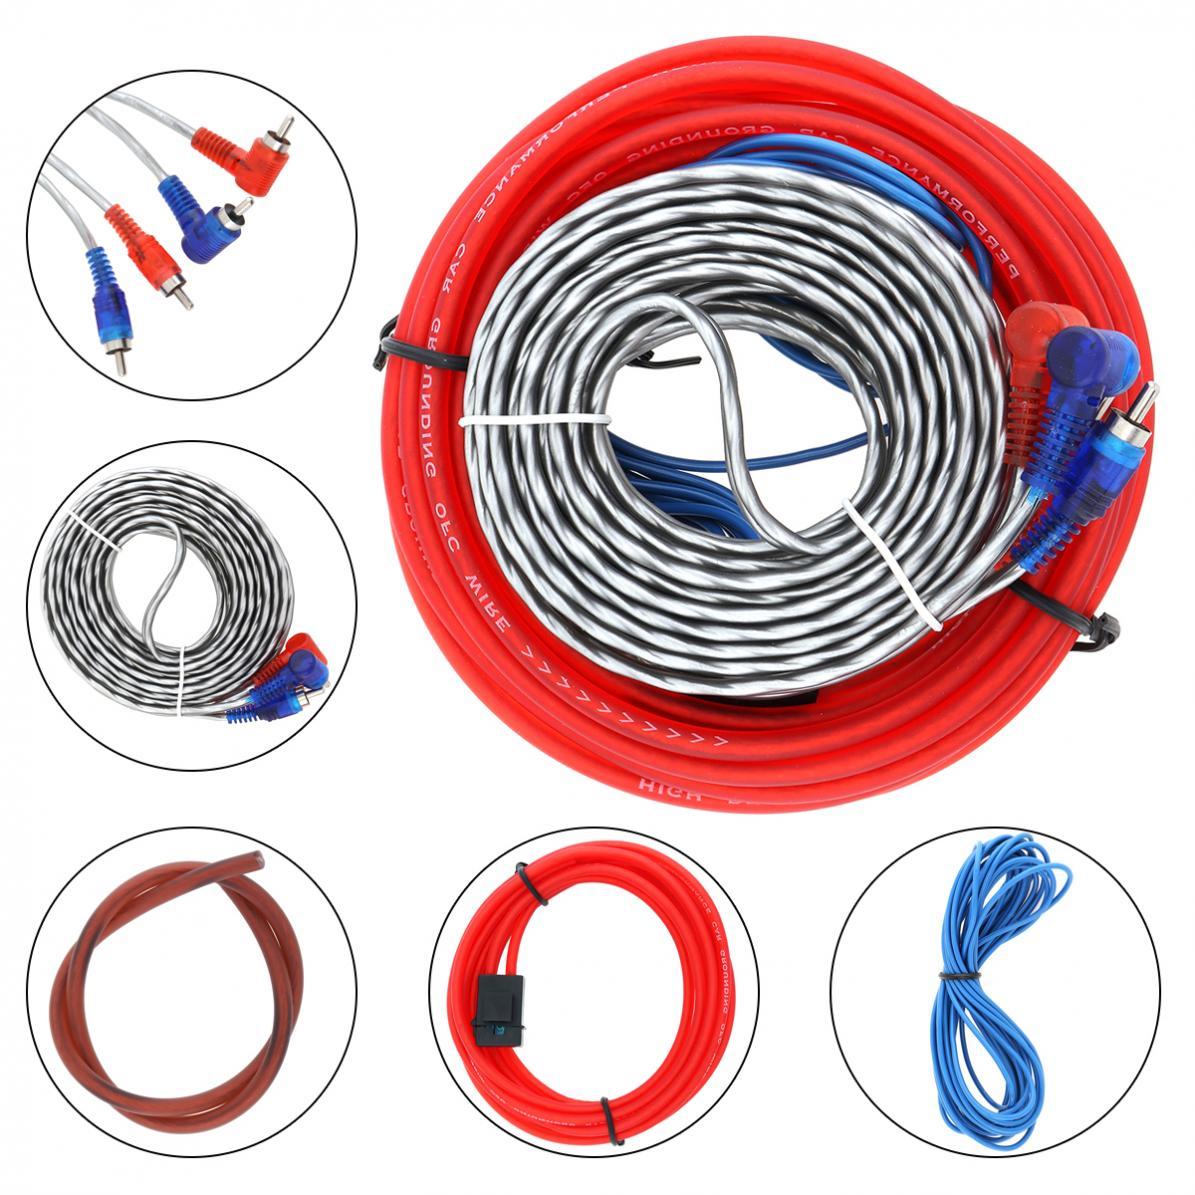 Car Auto Audio Wire Wiring Kit Car Speaker Woofer Cables Car Power Amplifier Audio Line Power Line For Car Modification